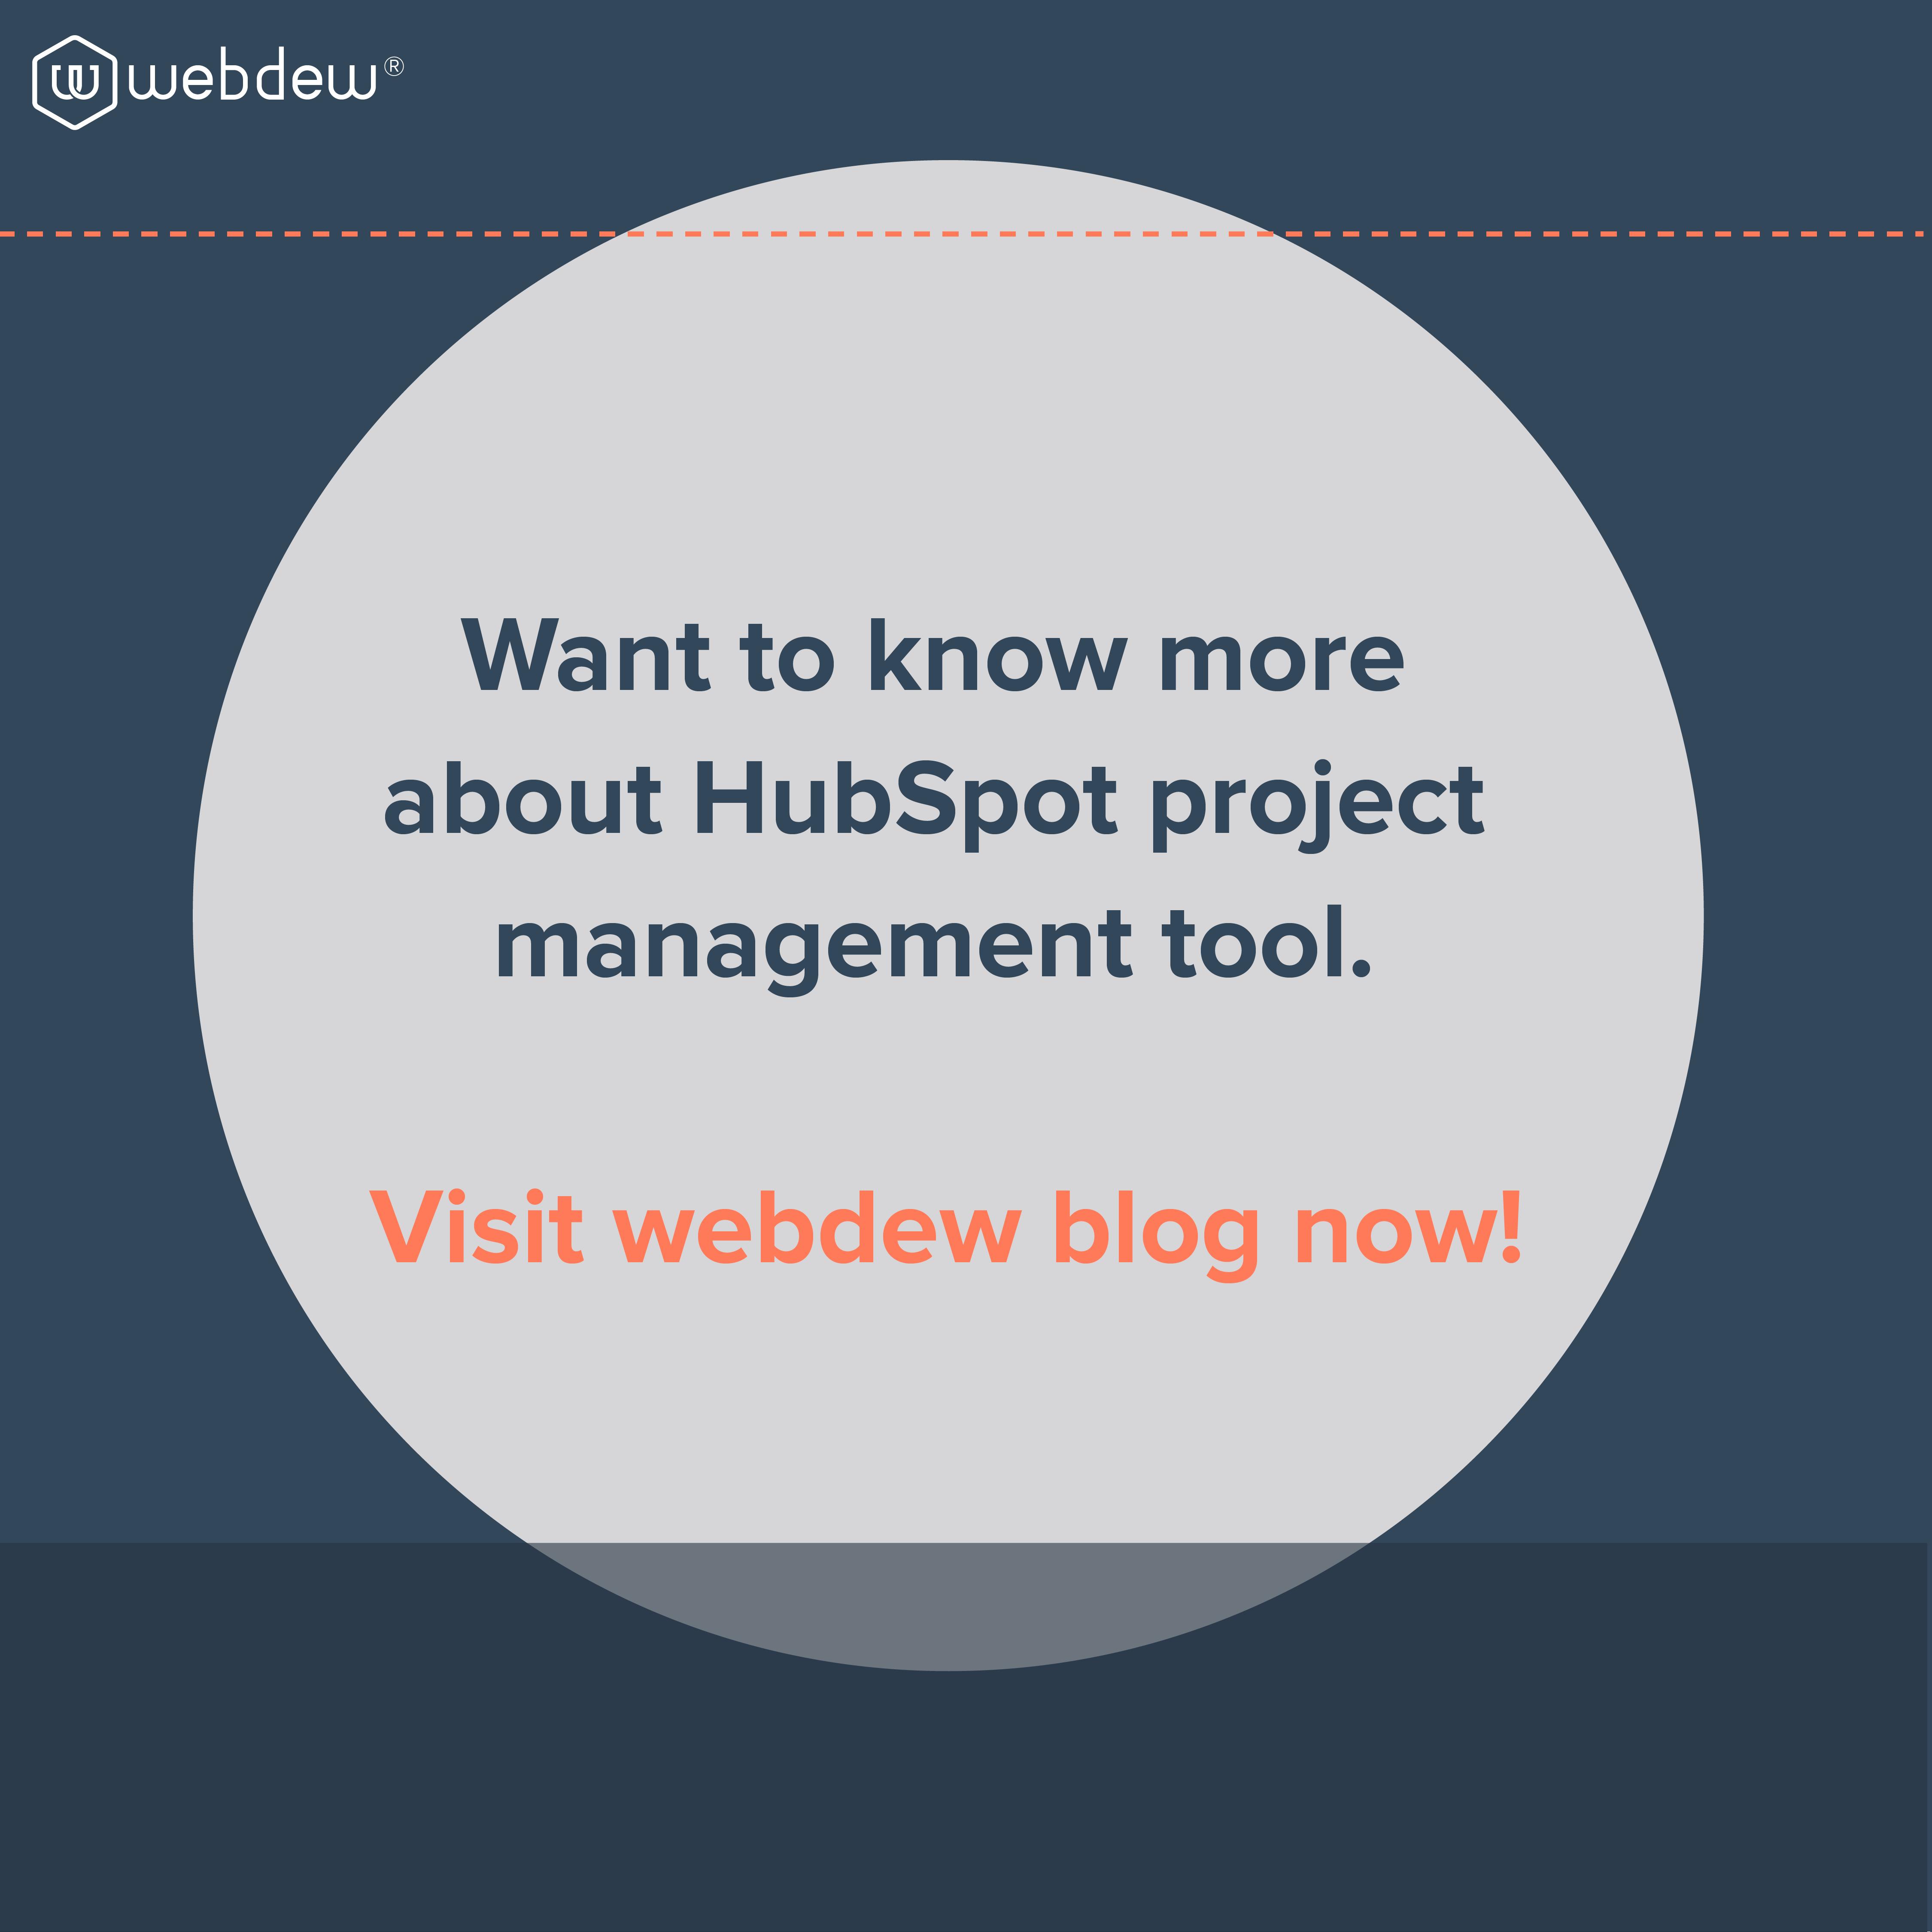 5. visit webdew blog now